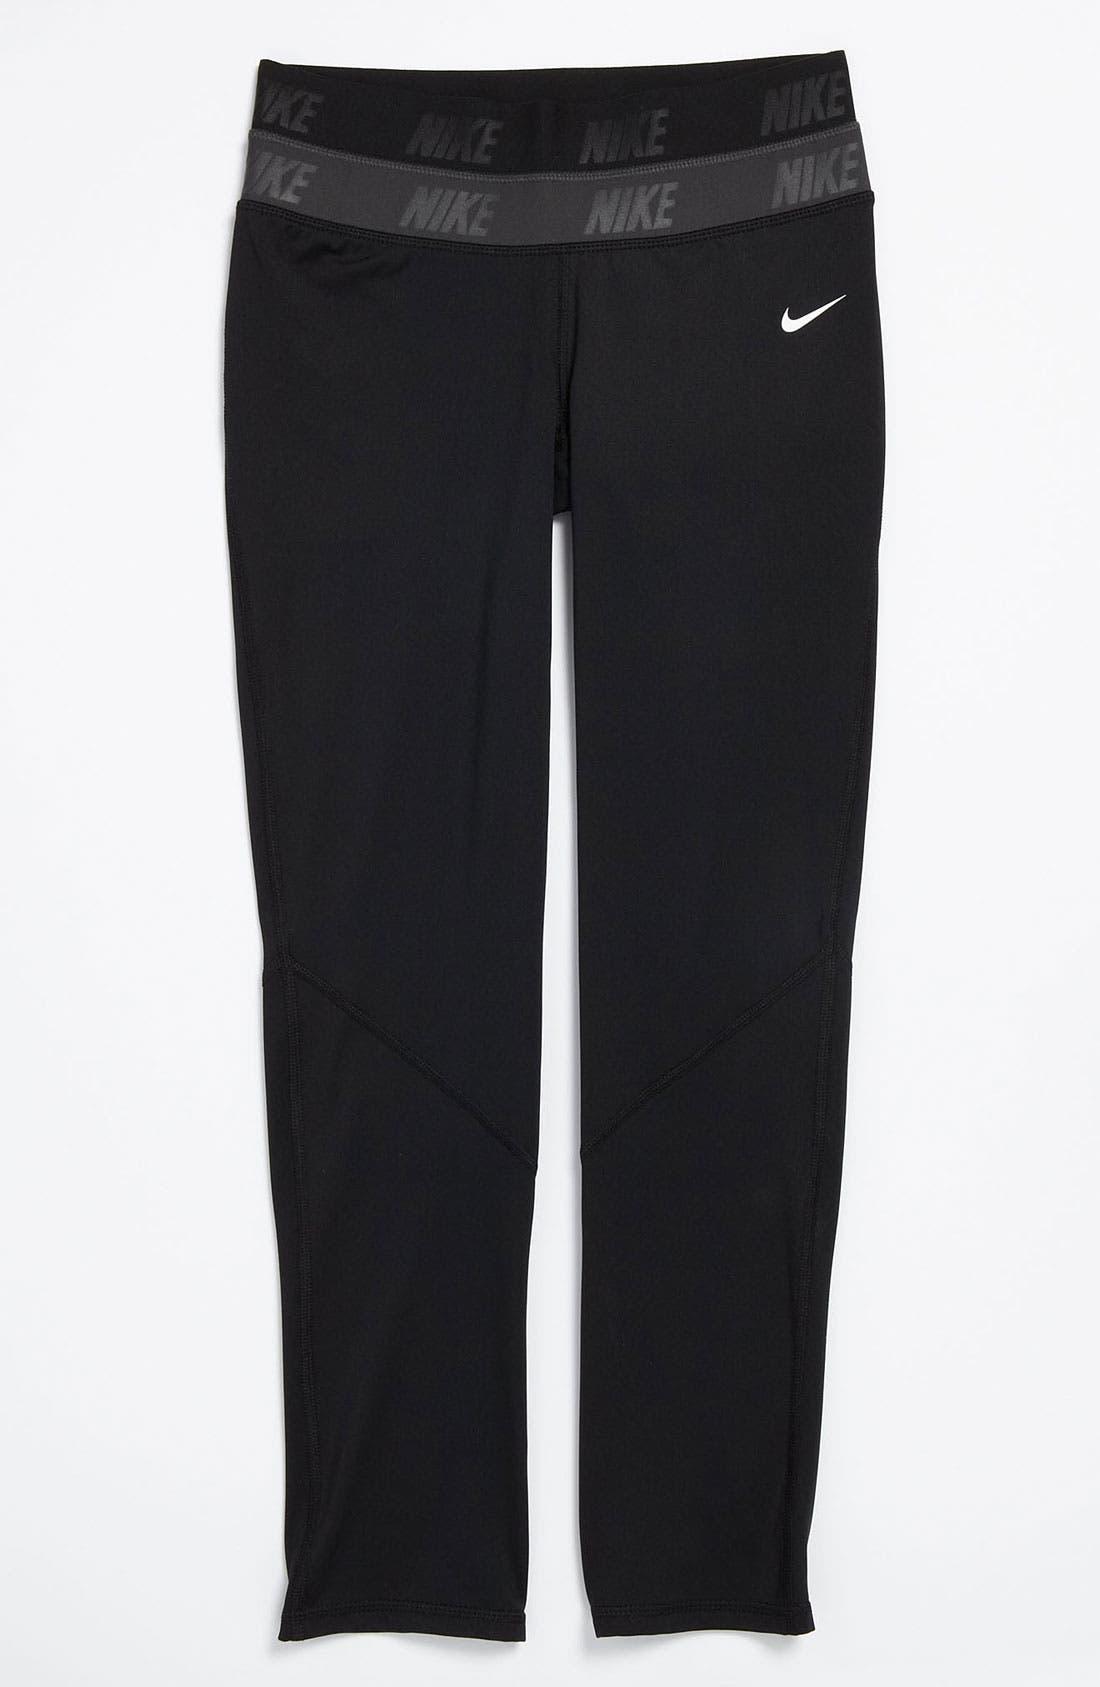 Main Image - Nike Pro 'Hyperwarm' Compression Tights (Big Girls)